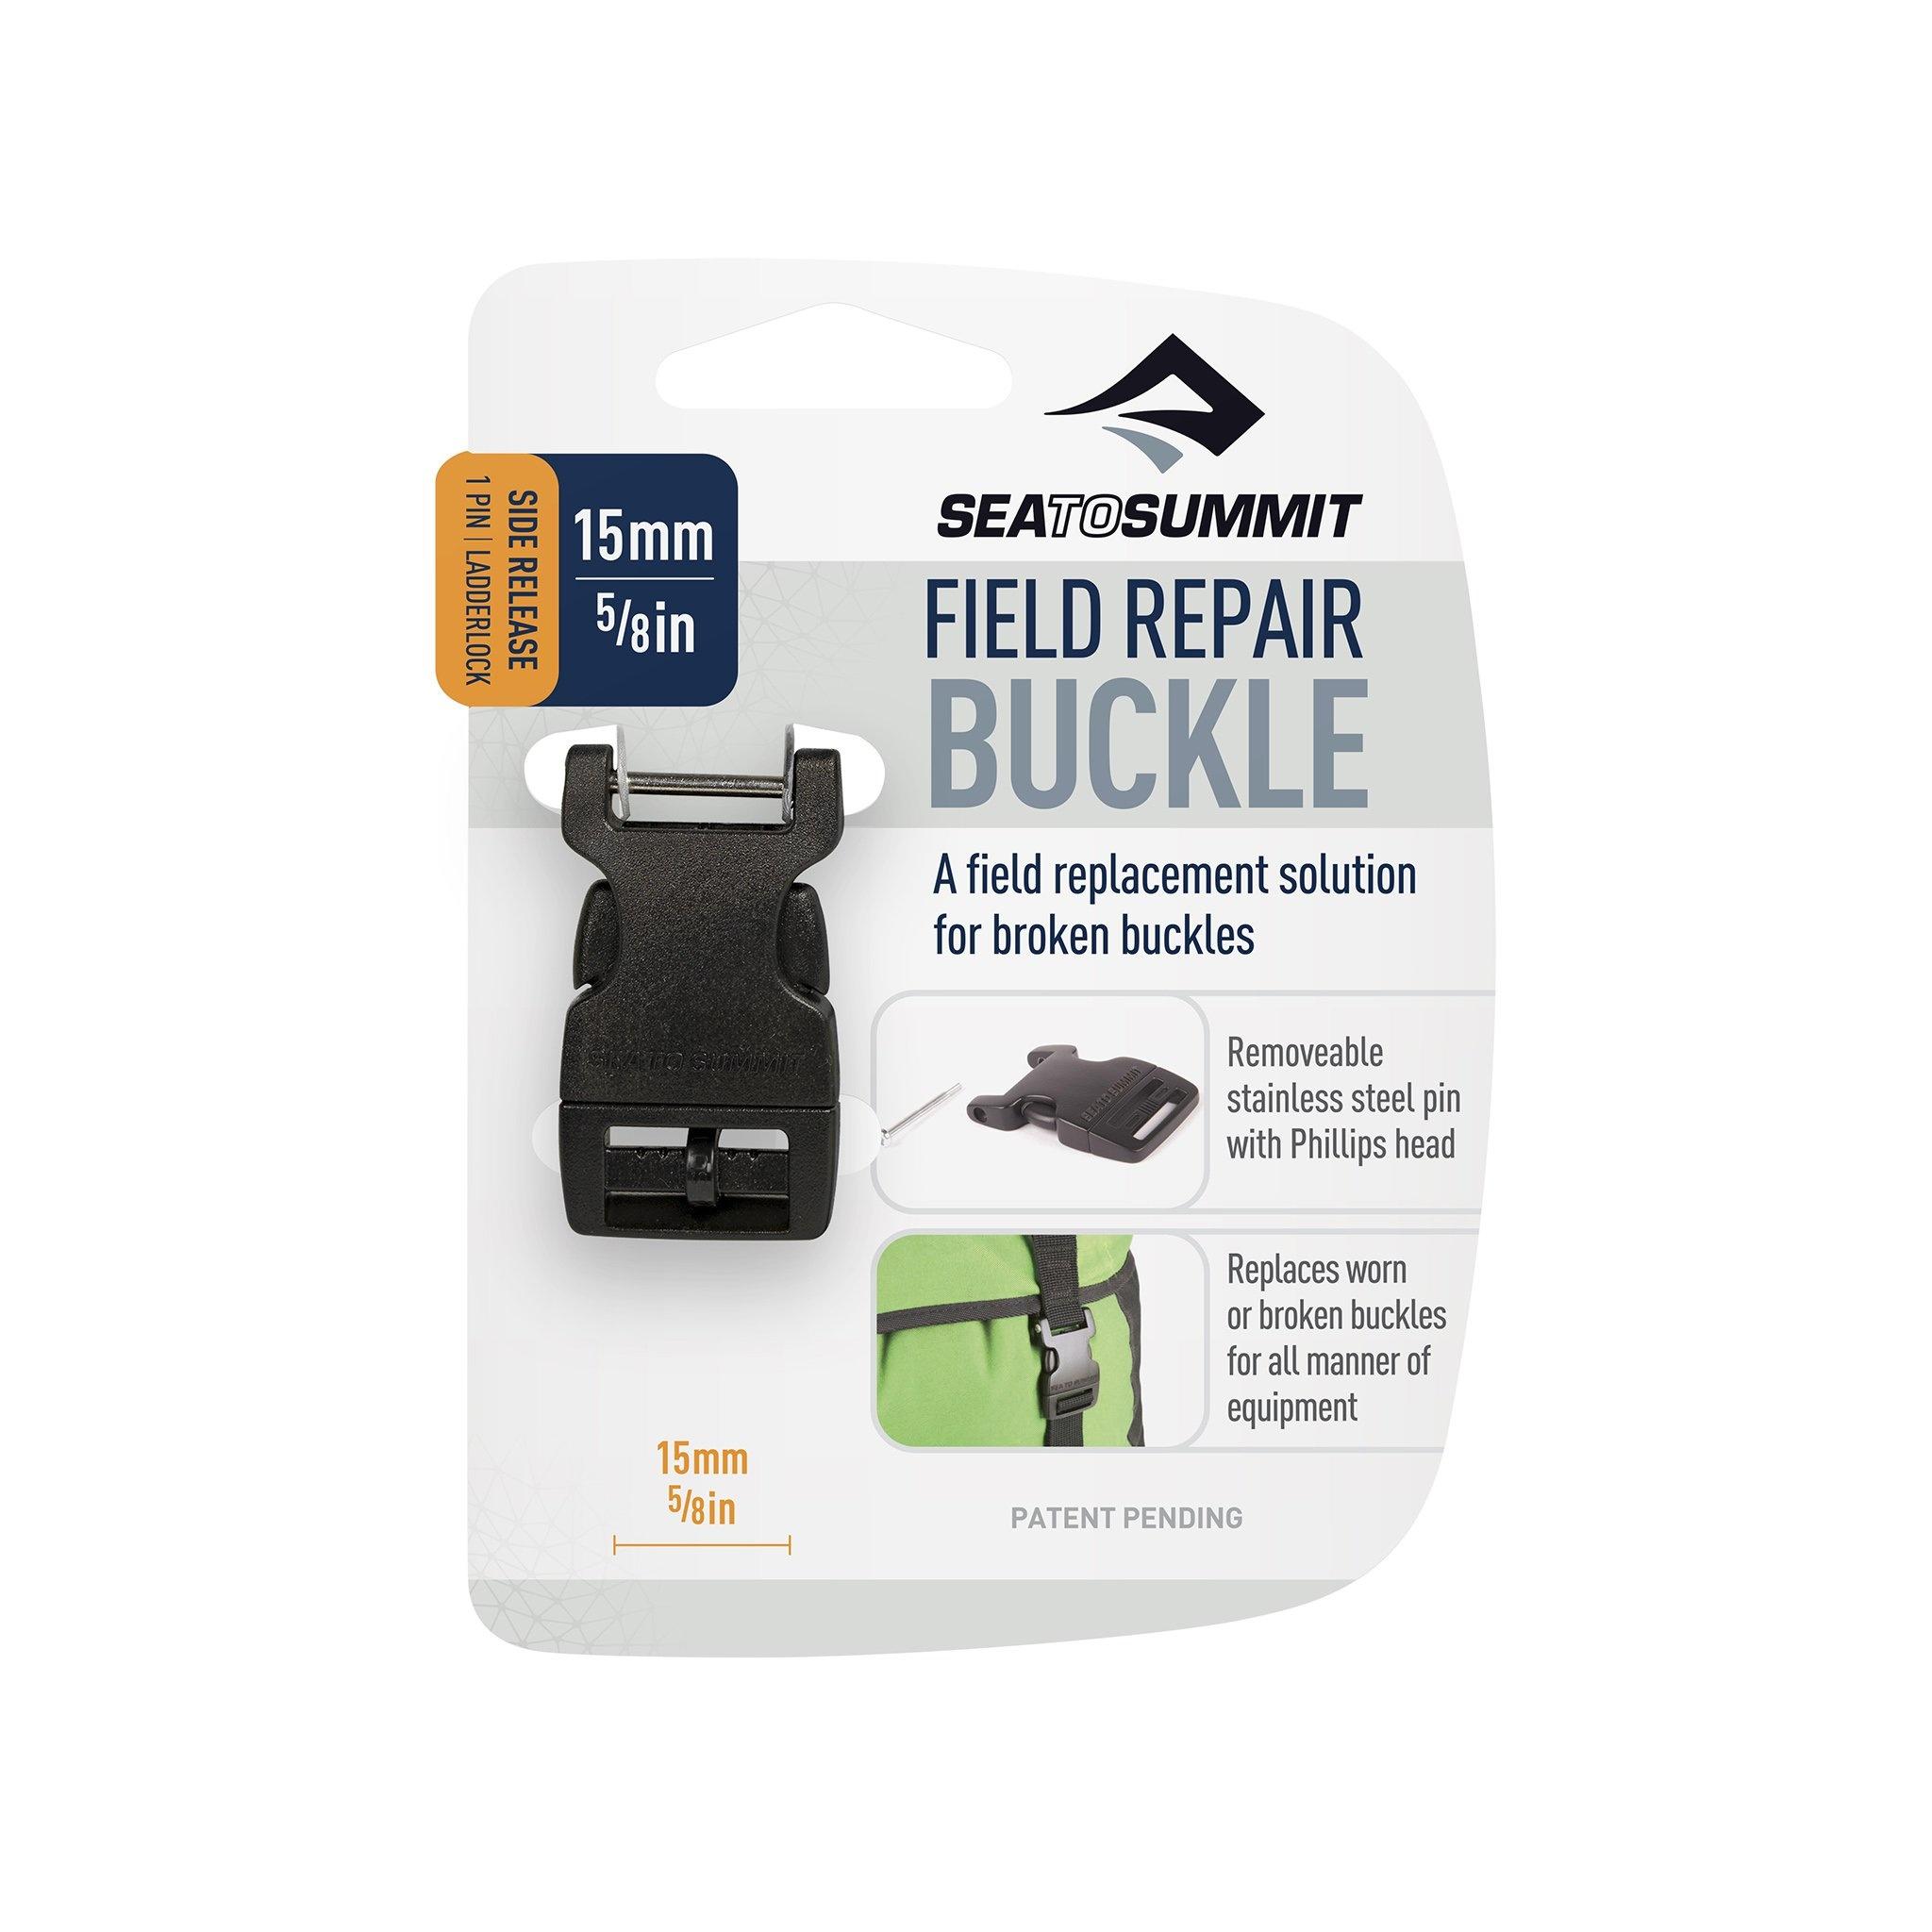 "Sea to Summit Field Repair Buckle 15mm / 5/8"" Side Release 1 Pin"